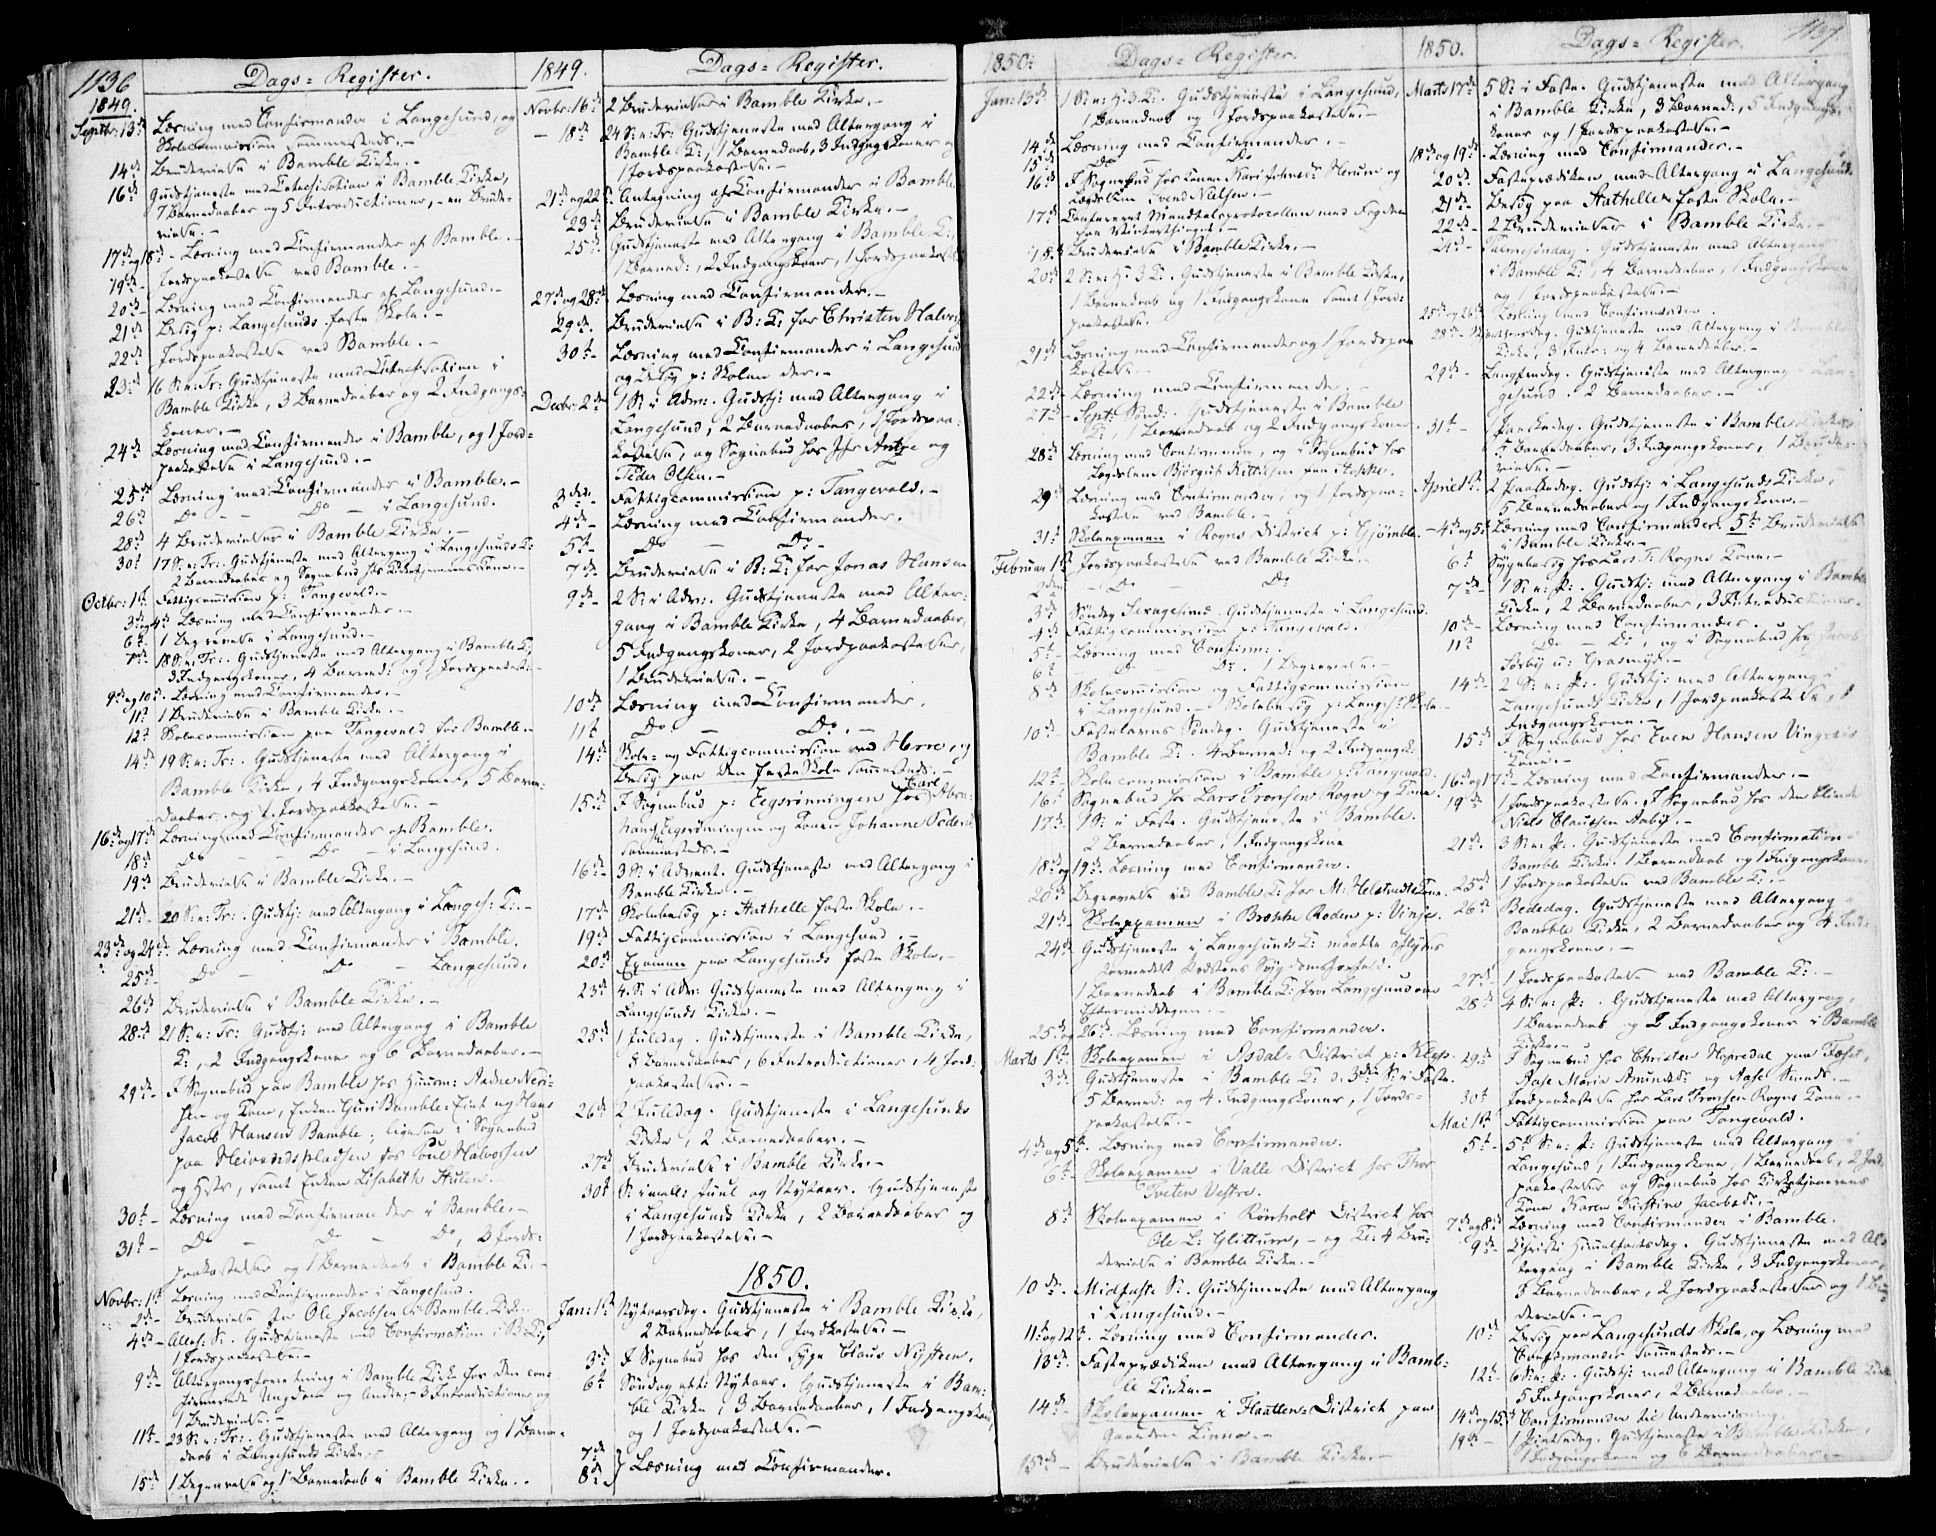 SAKO, Bamble kirkebøker, F/Fa/L0004: Ministerialbok nr. I 4, 1834-1853, s. 1136-1137